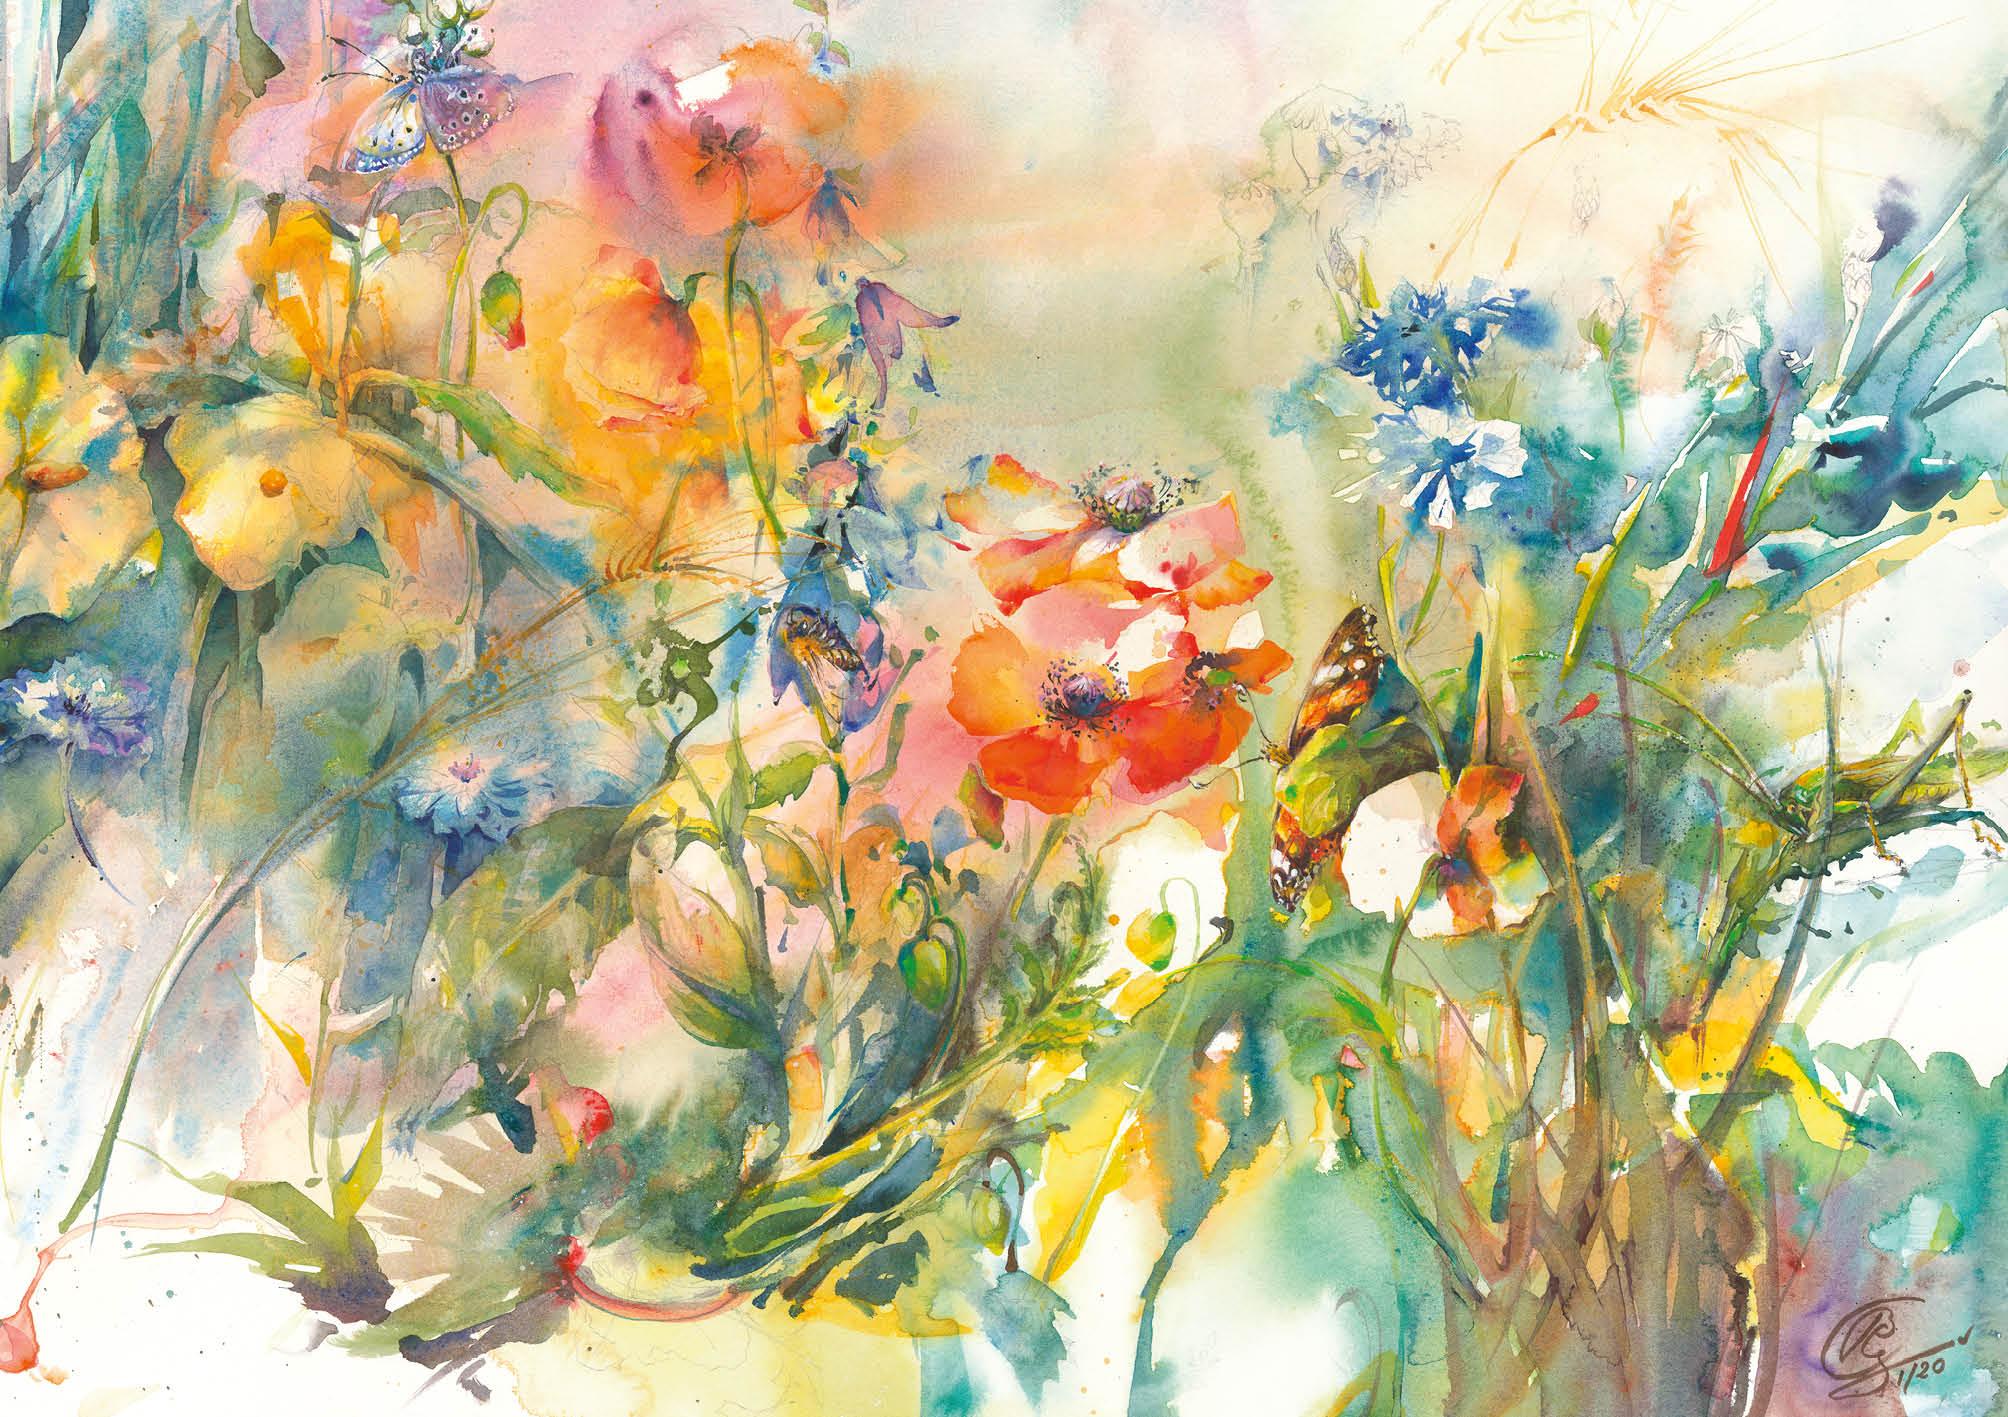 Blumensamen-Karte - Insekten am Wiesenrand